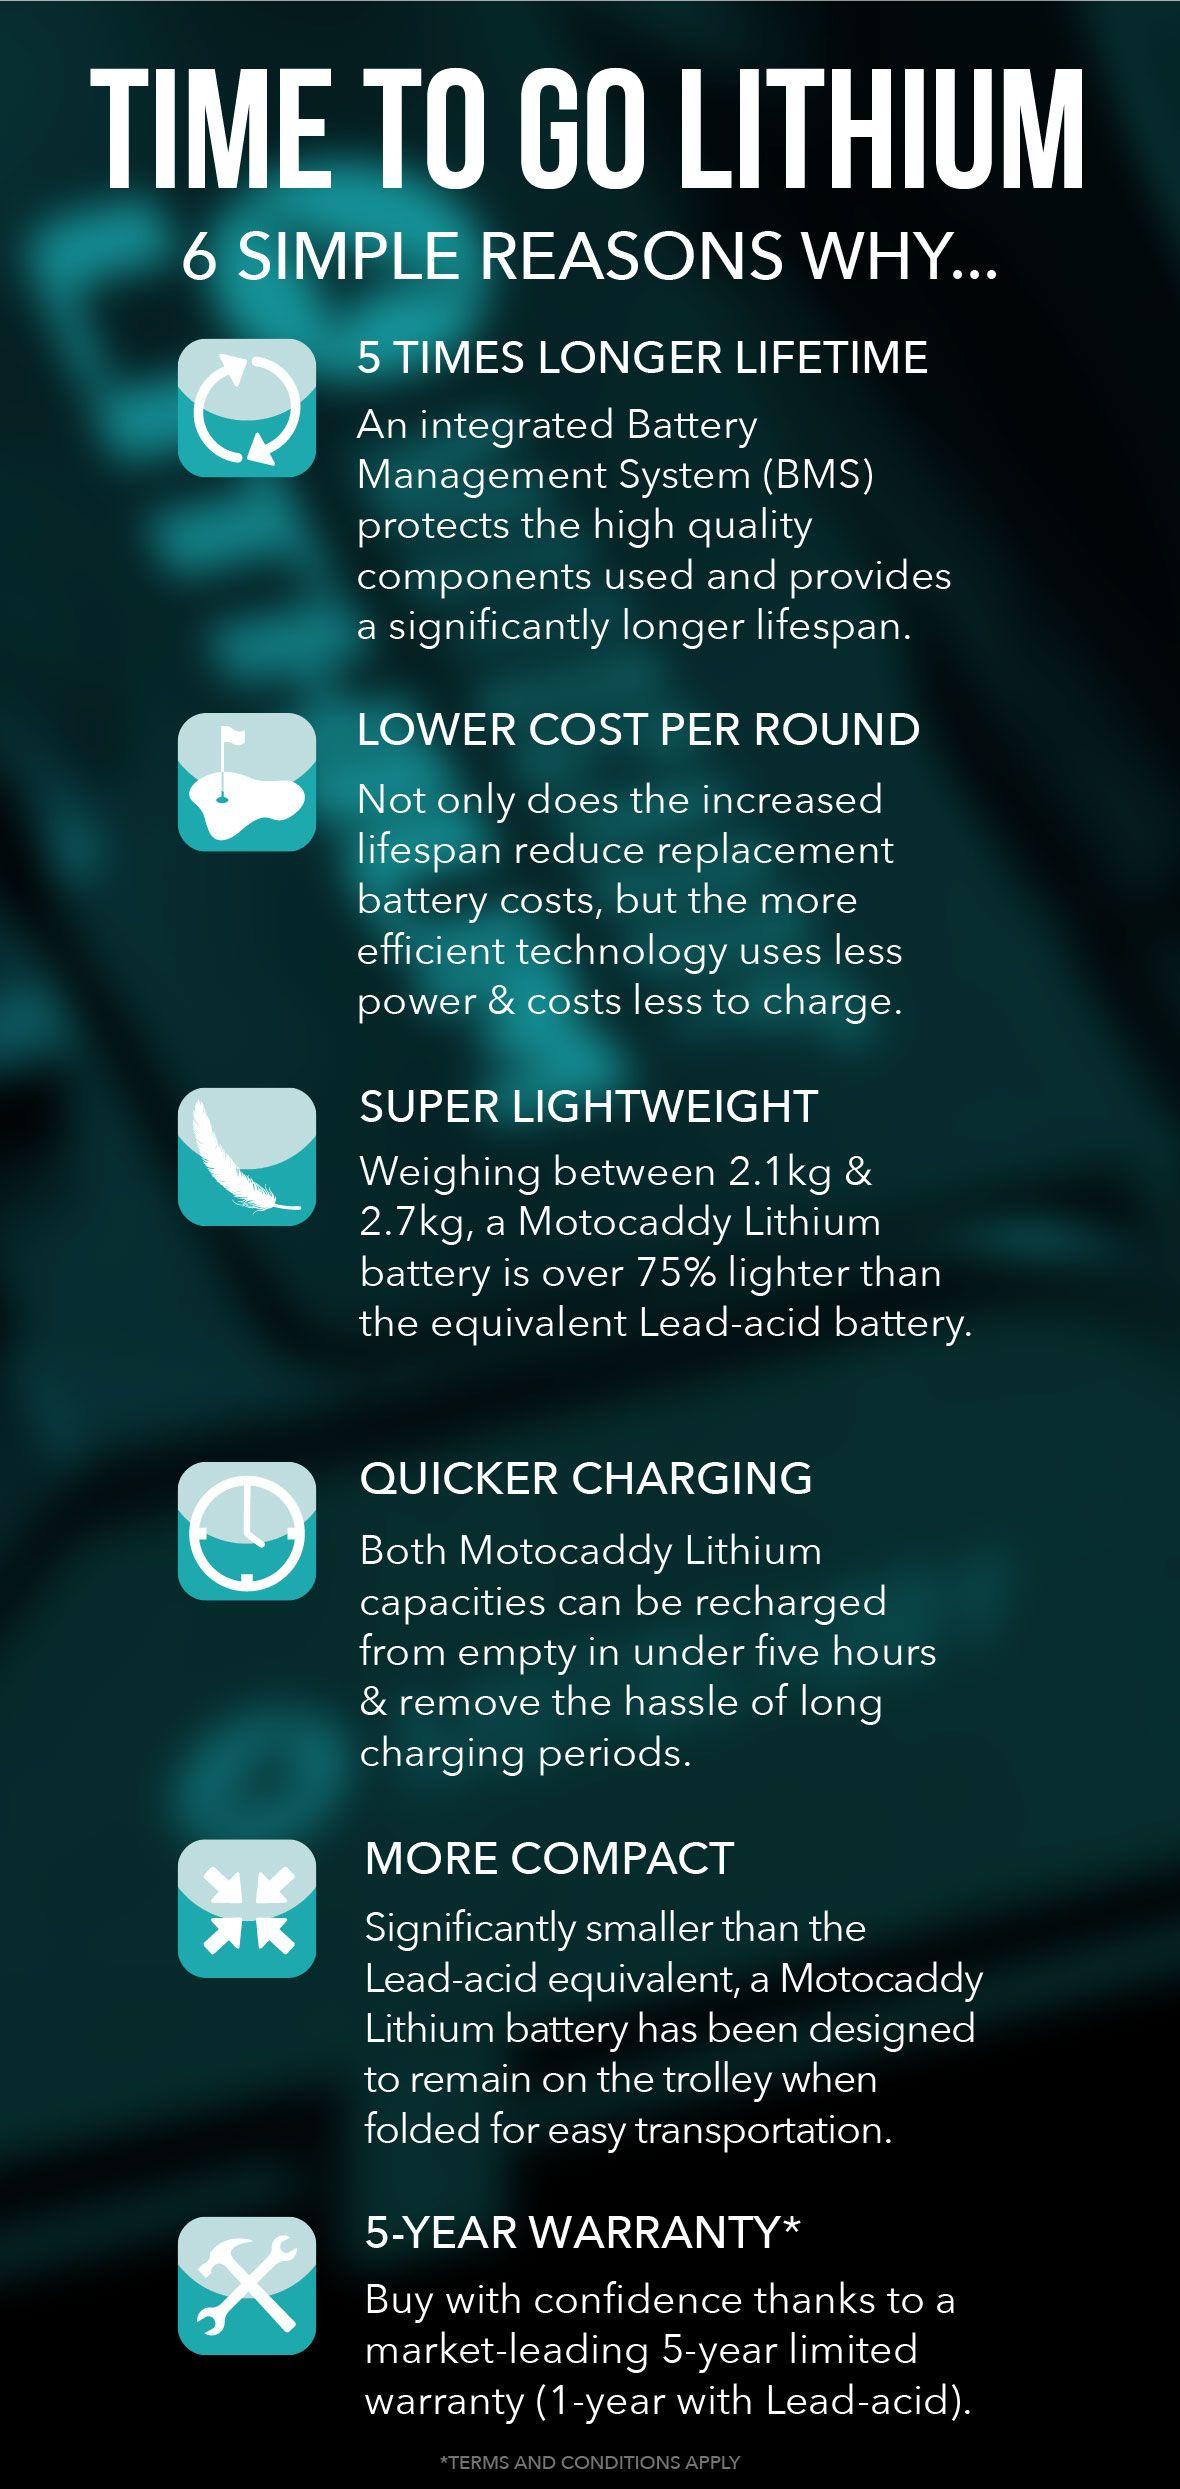 Motocaddy Lithium battery Upgrade